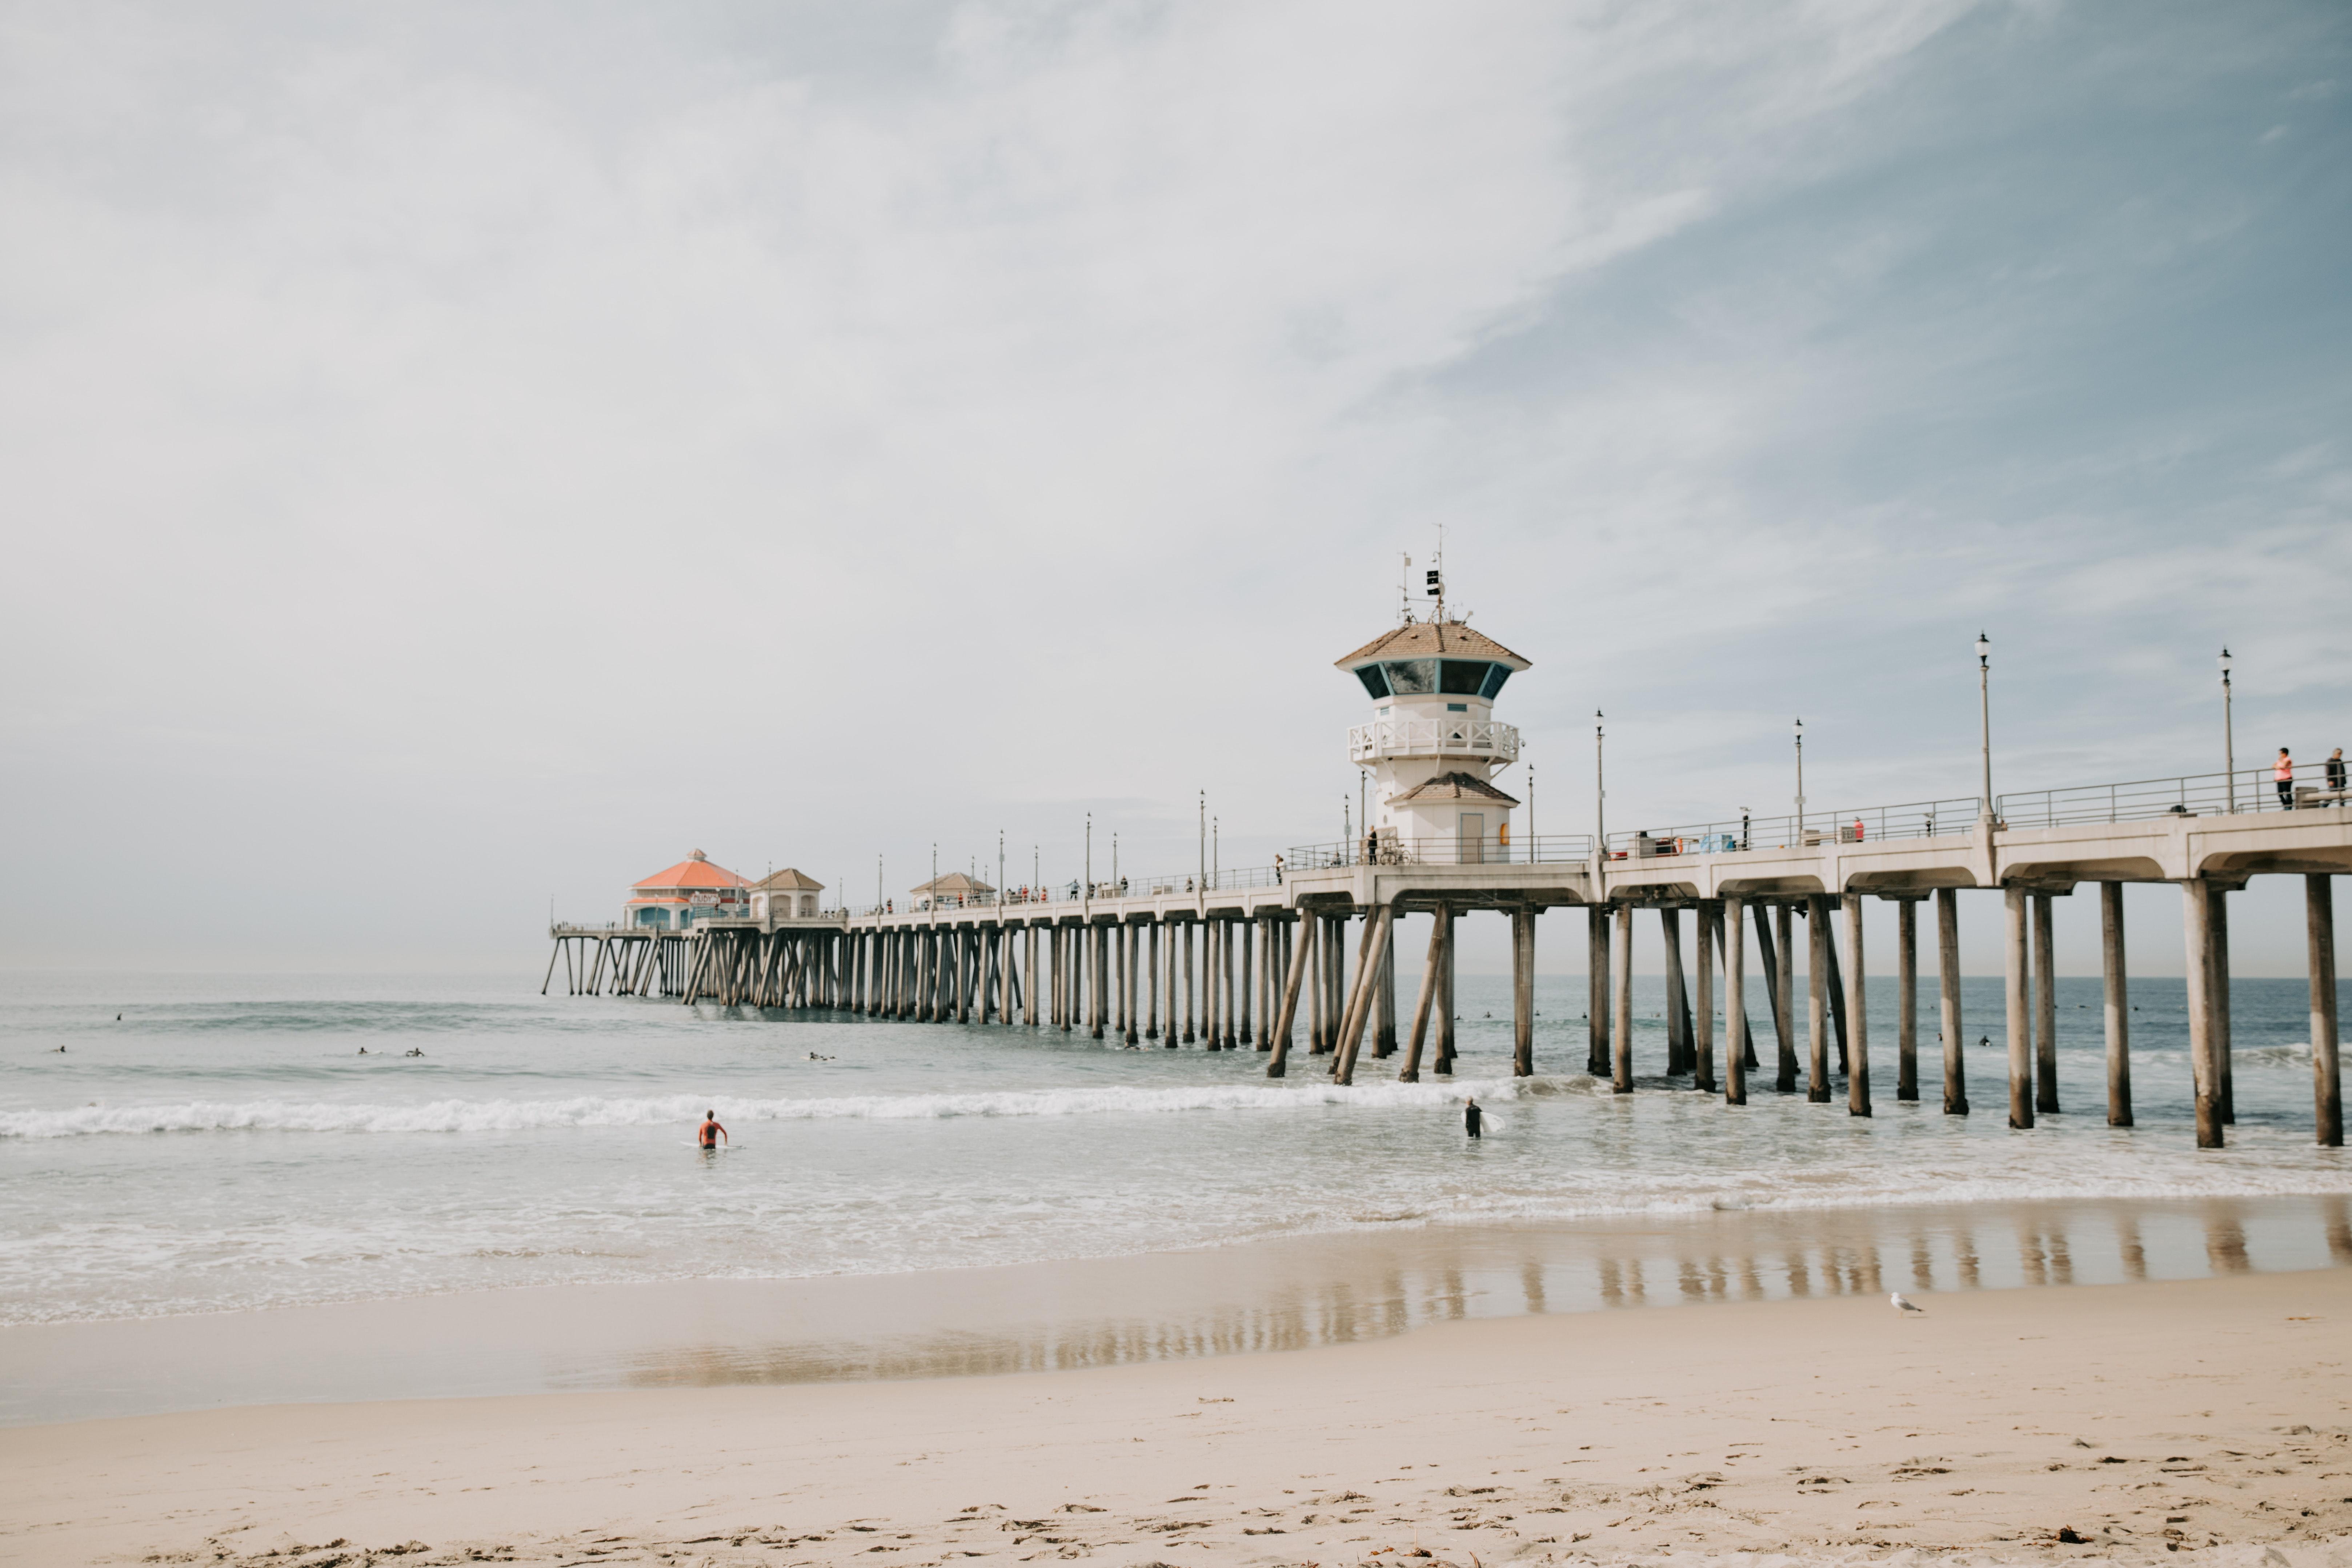 Photo of White Concrete Dock Bridge on Ocean, Seashore, Seascape, Scenic, Tranquil, HQ Photo